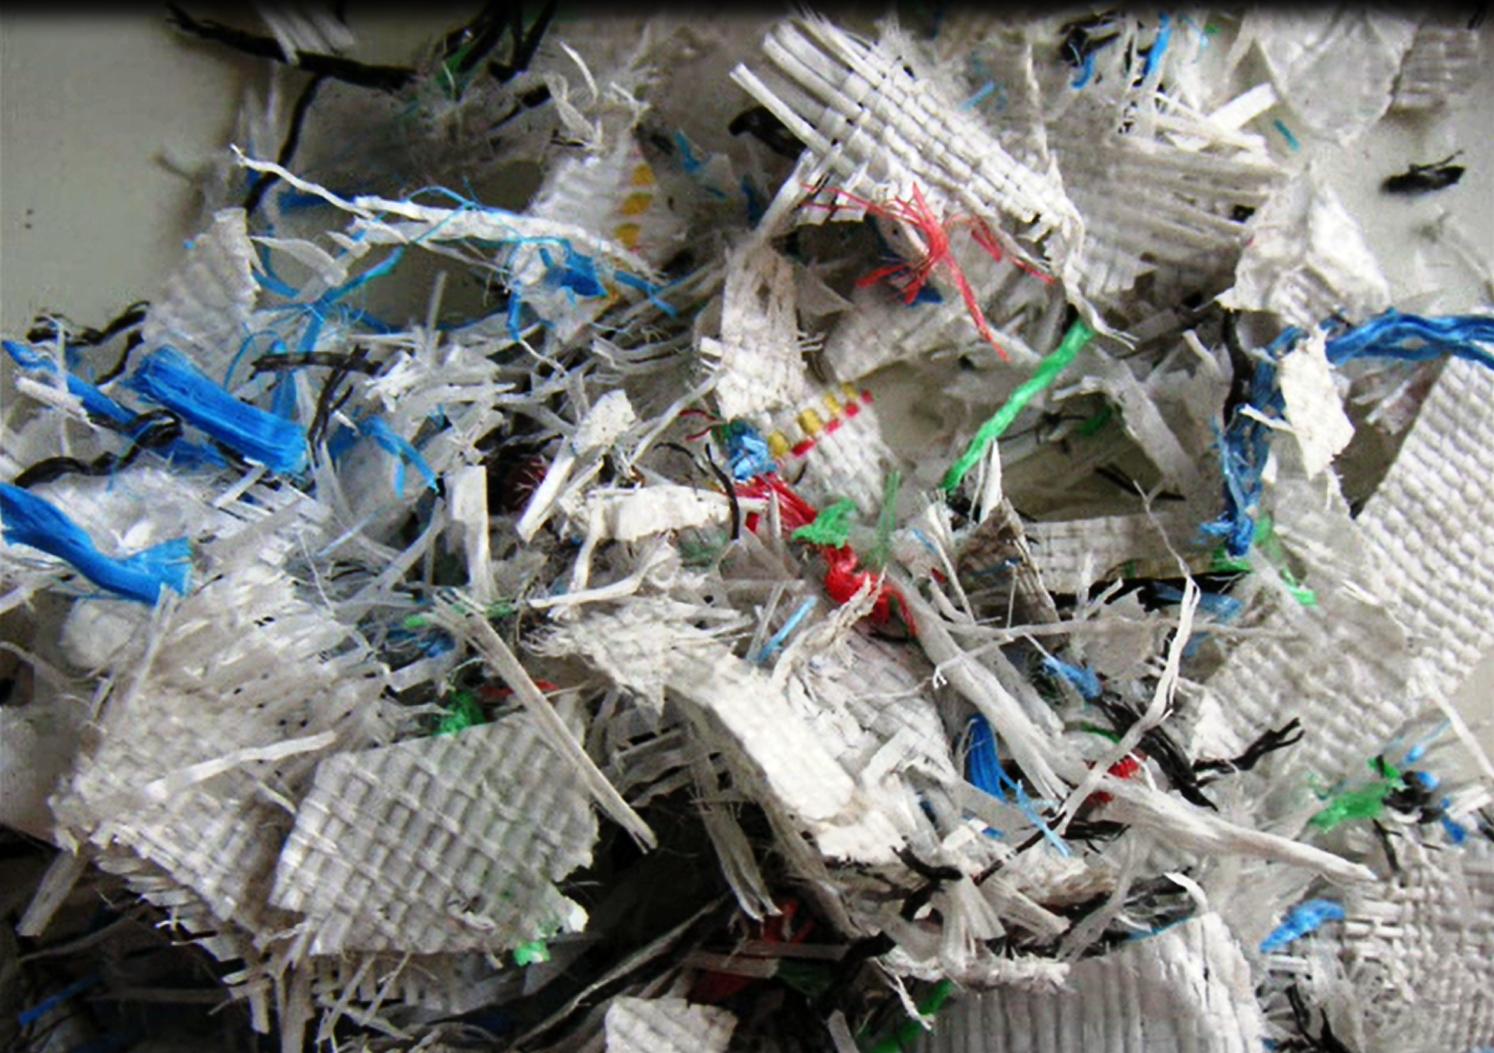 residus plàstics